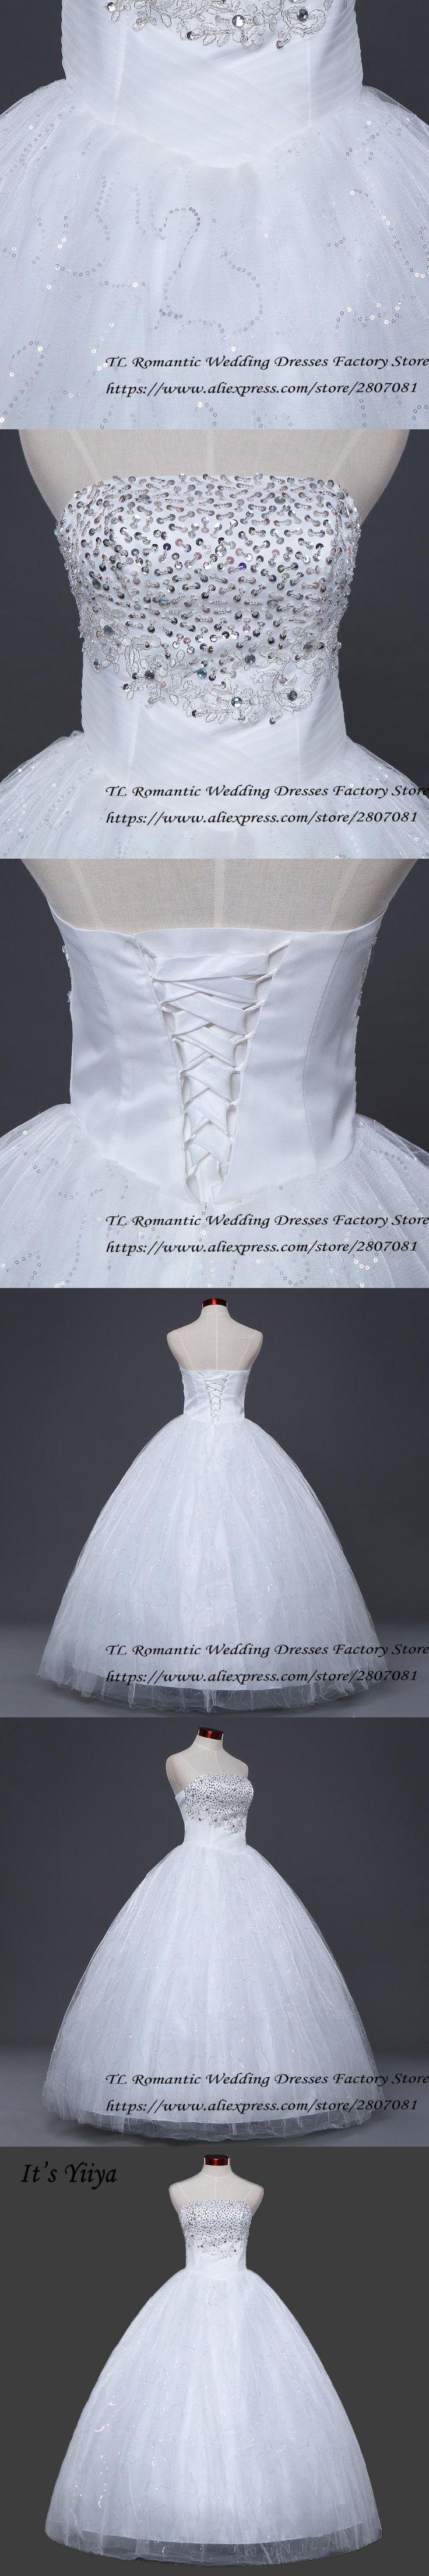 Free Shipping Sweetheart Strapless Wedding Dress 2017 design White Summer Style Bride Frocks Real Photo Vestidos De Novia MY201